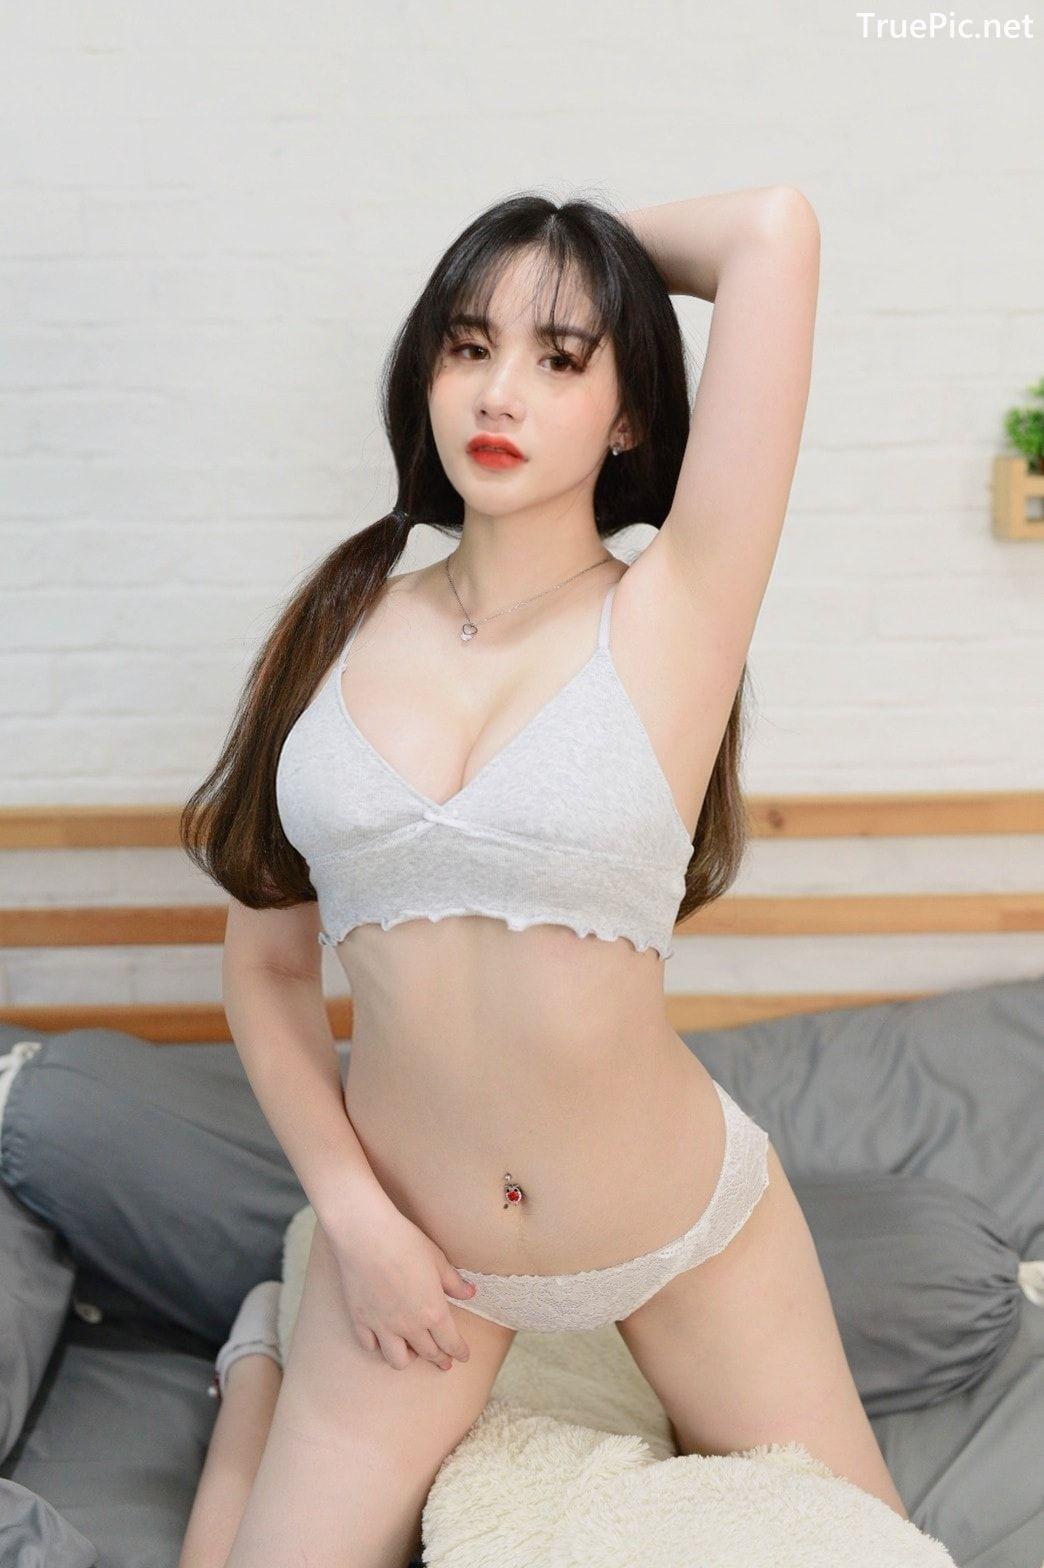 Image Thailand Model - Akair Manita - Sexy White Lingerie - TruePic.net - Picture-1